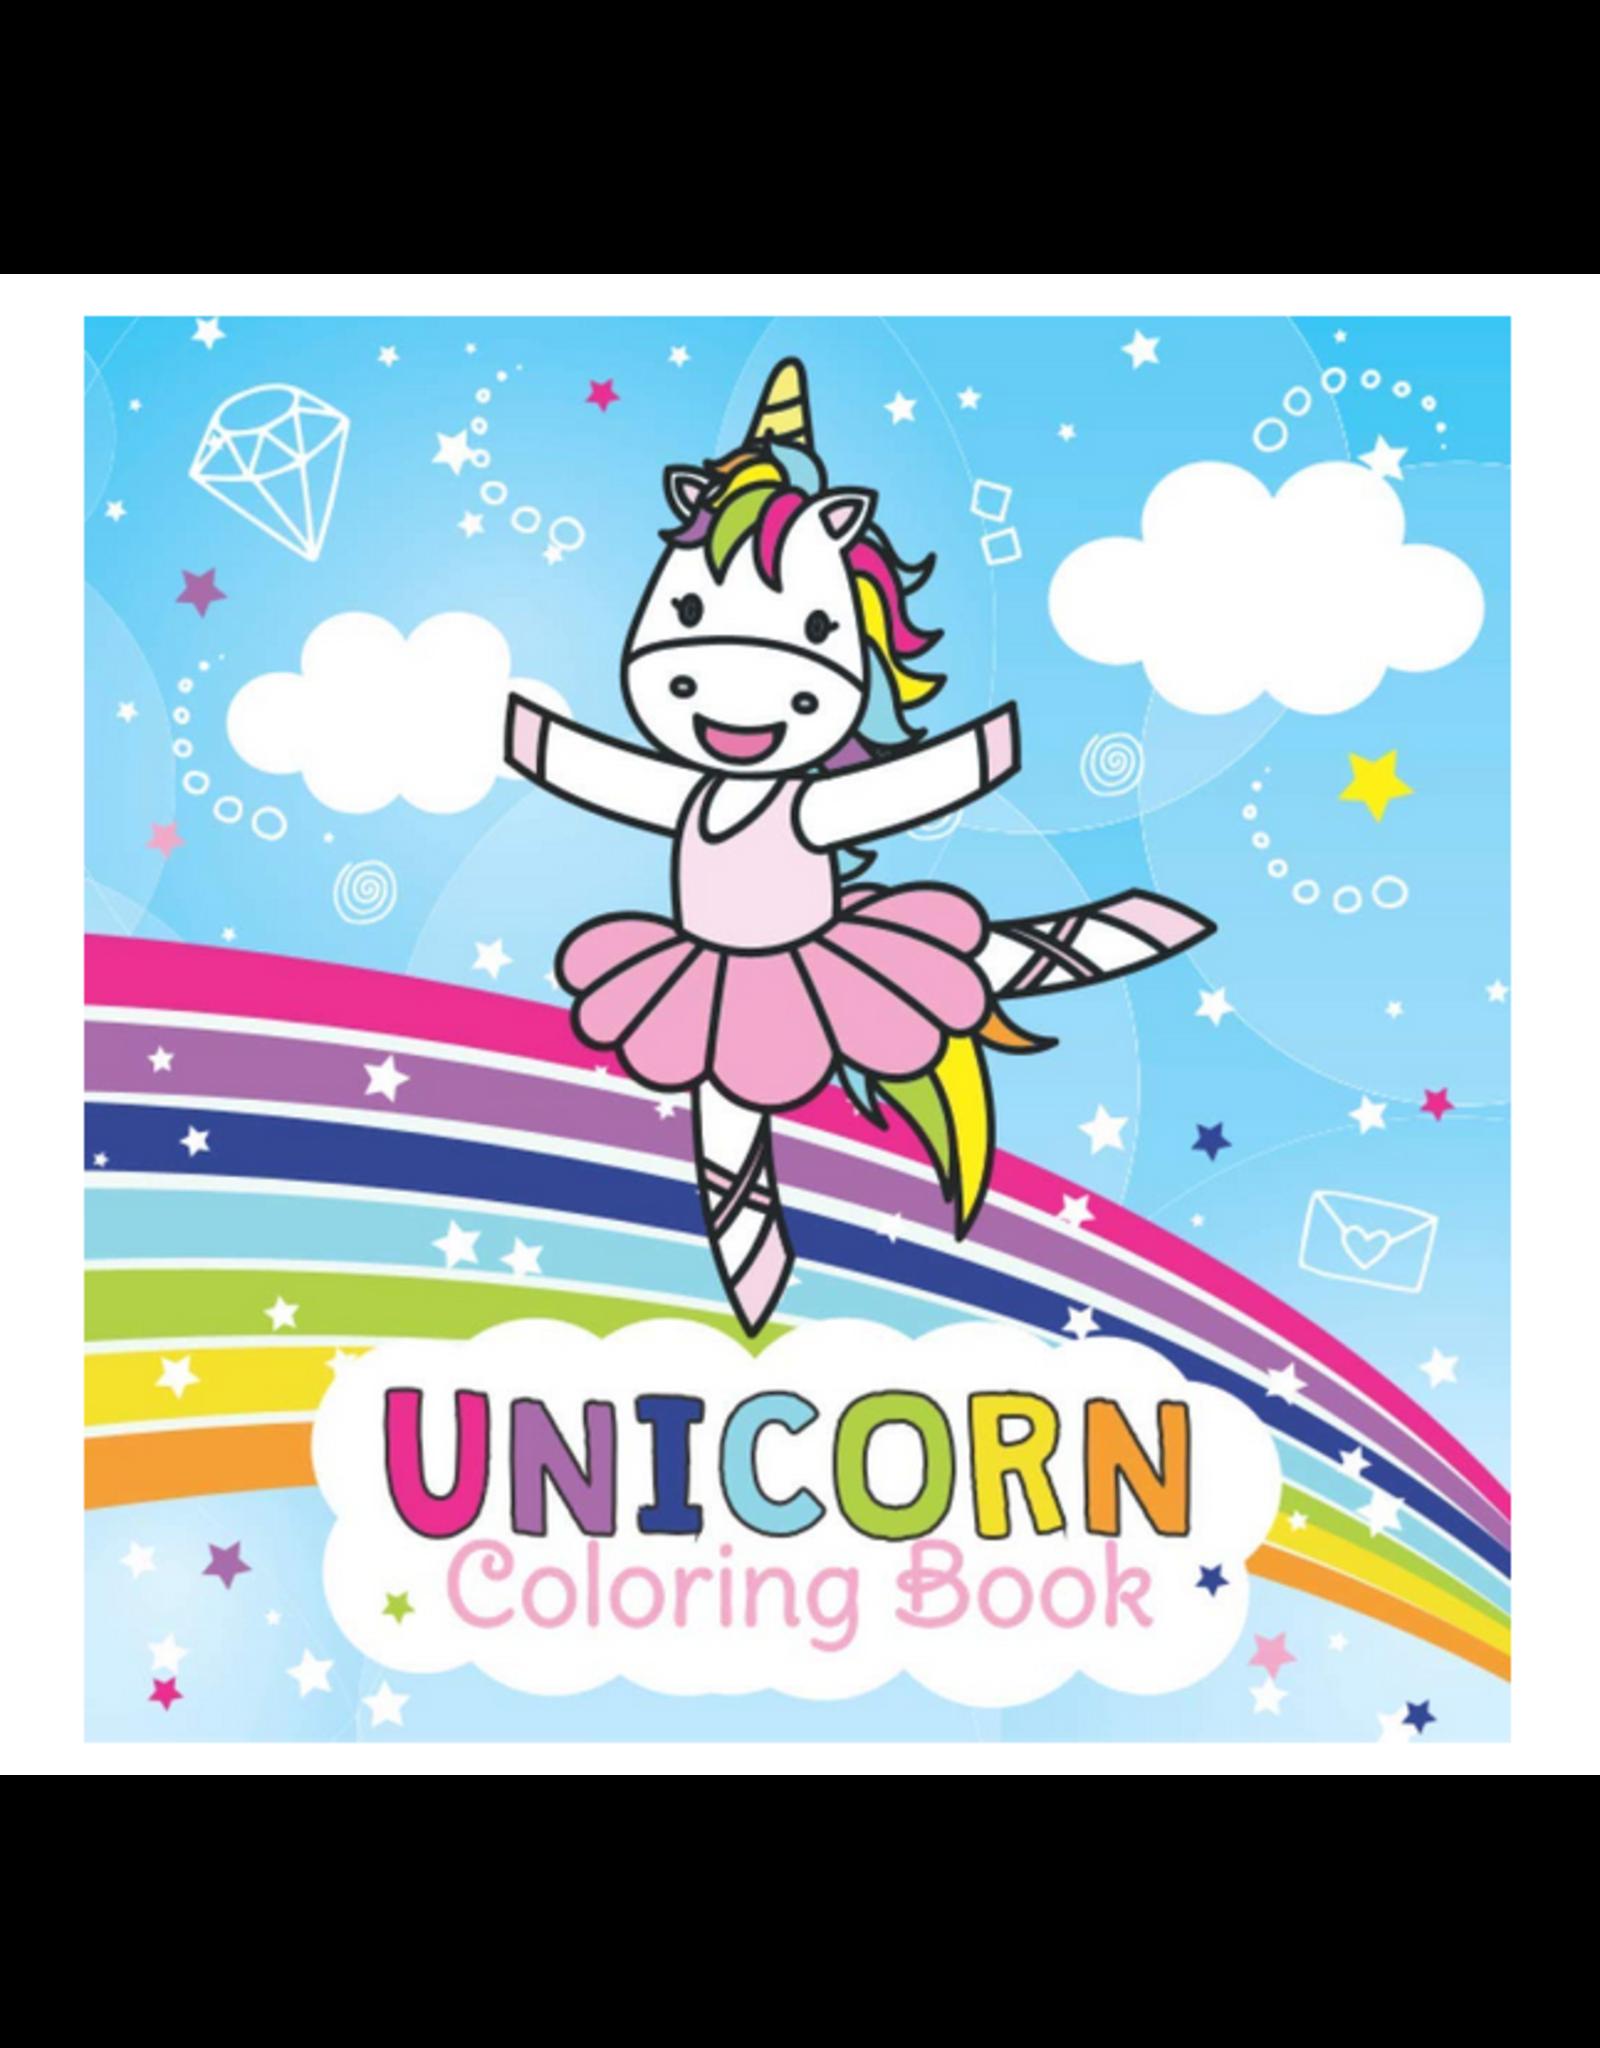 Jennifer Little Colouring Book for Kids, Unicorns